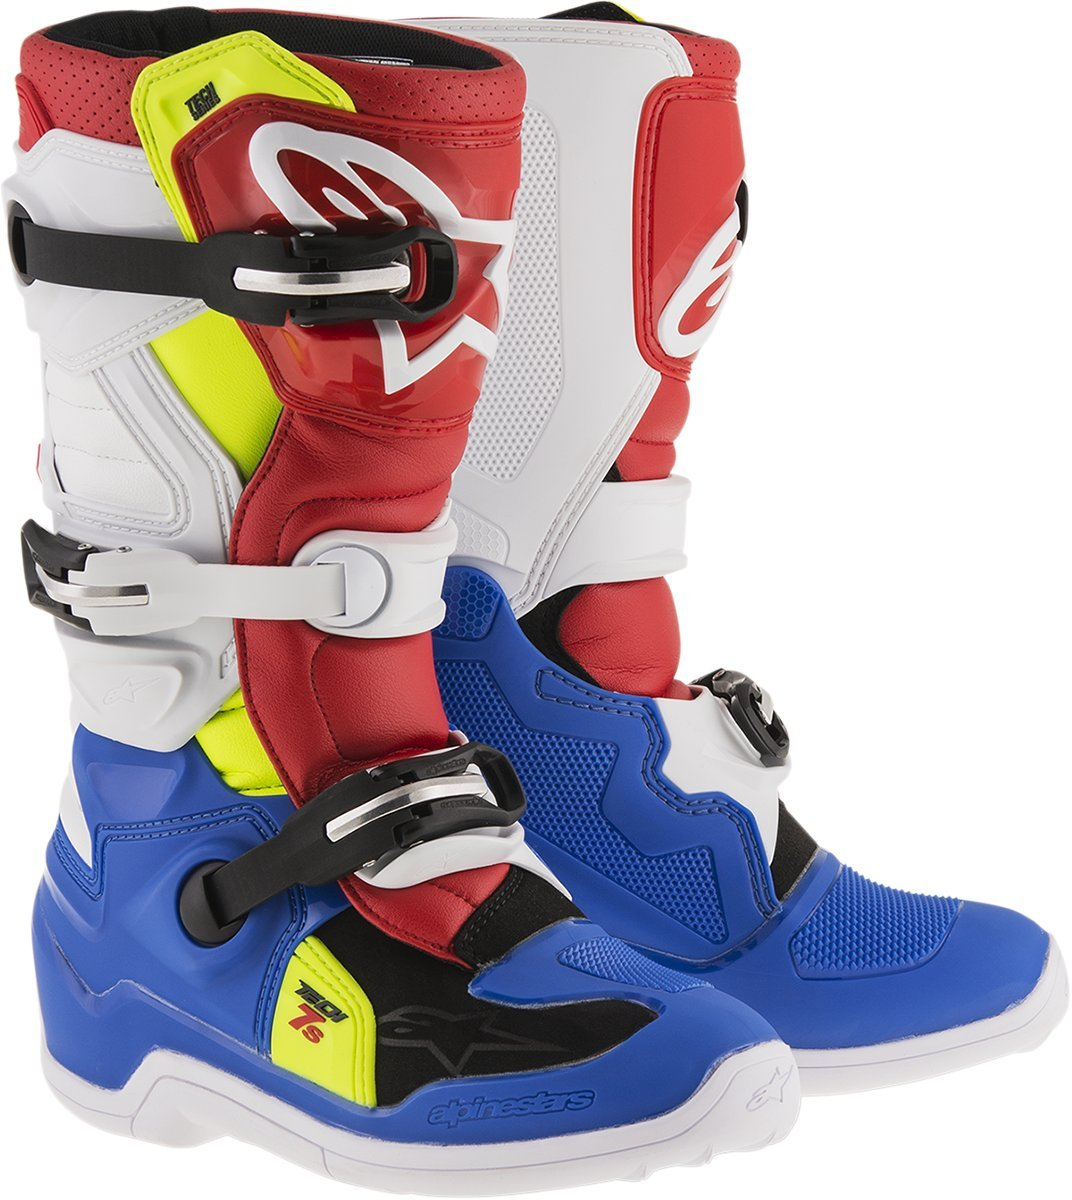 Alpinestars Blue White Red Yellow Flourescent 2017 Tech 7S Kids MX Boot